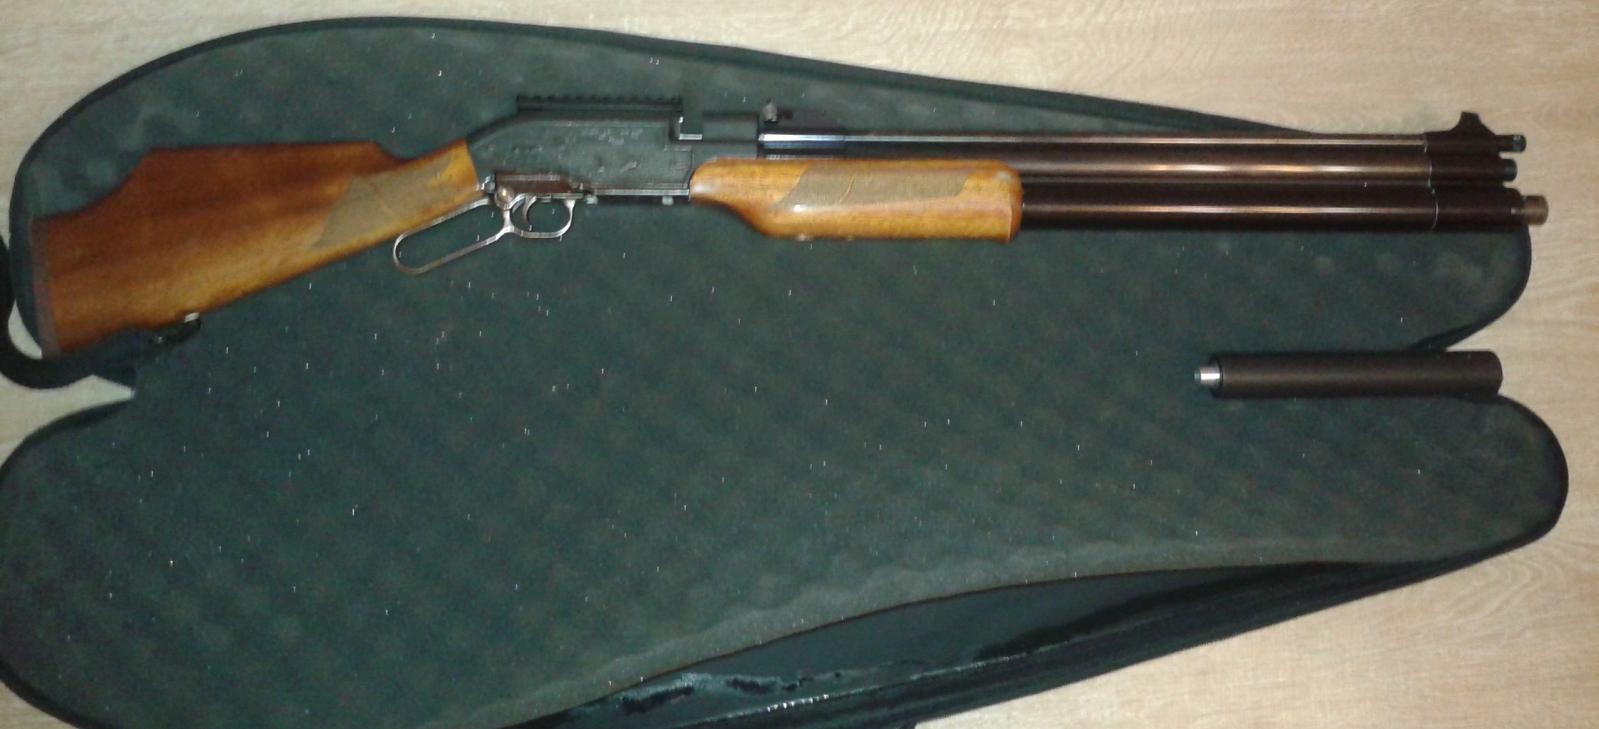 Продам Sumatra винтовка cal 6.35 объем 500 27x2fd5